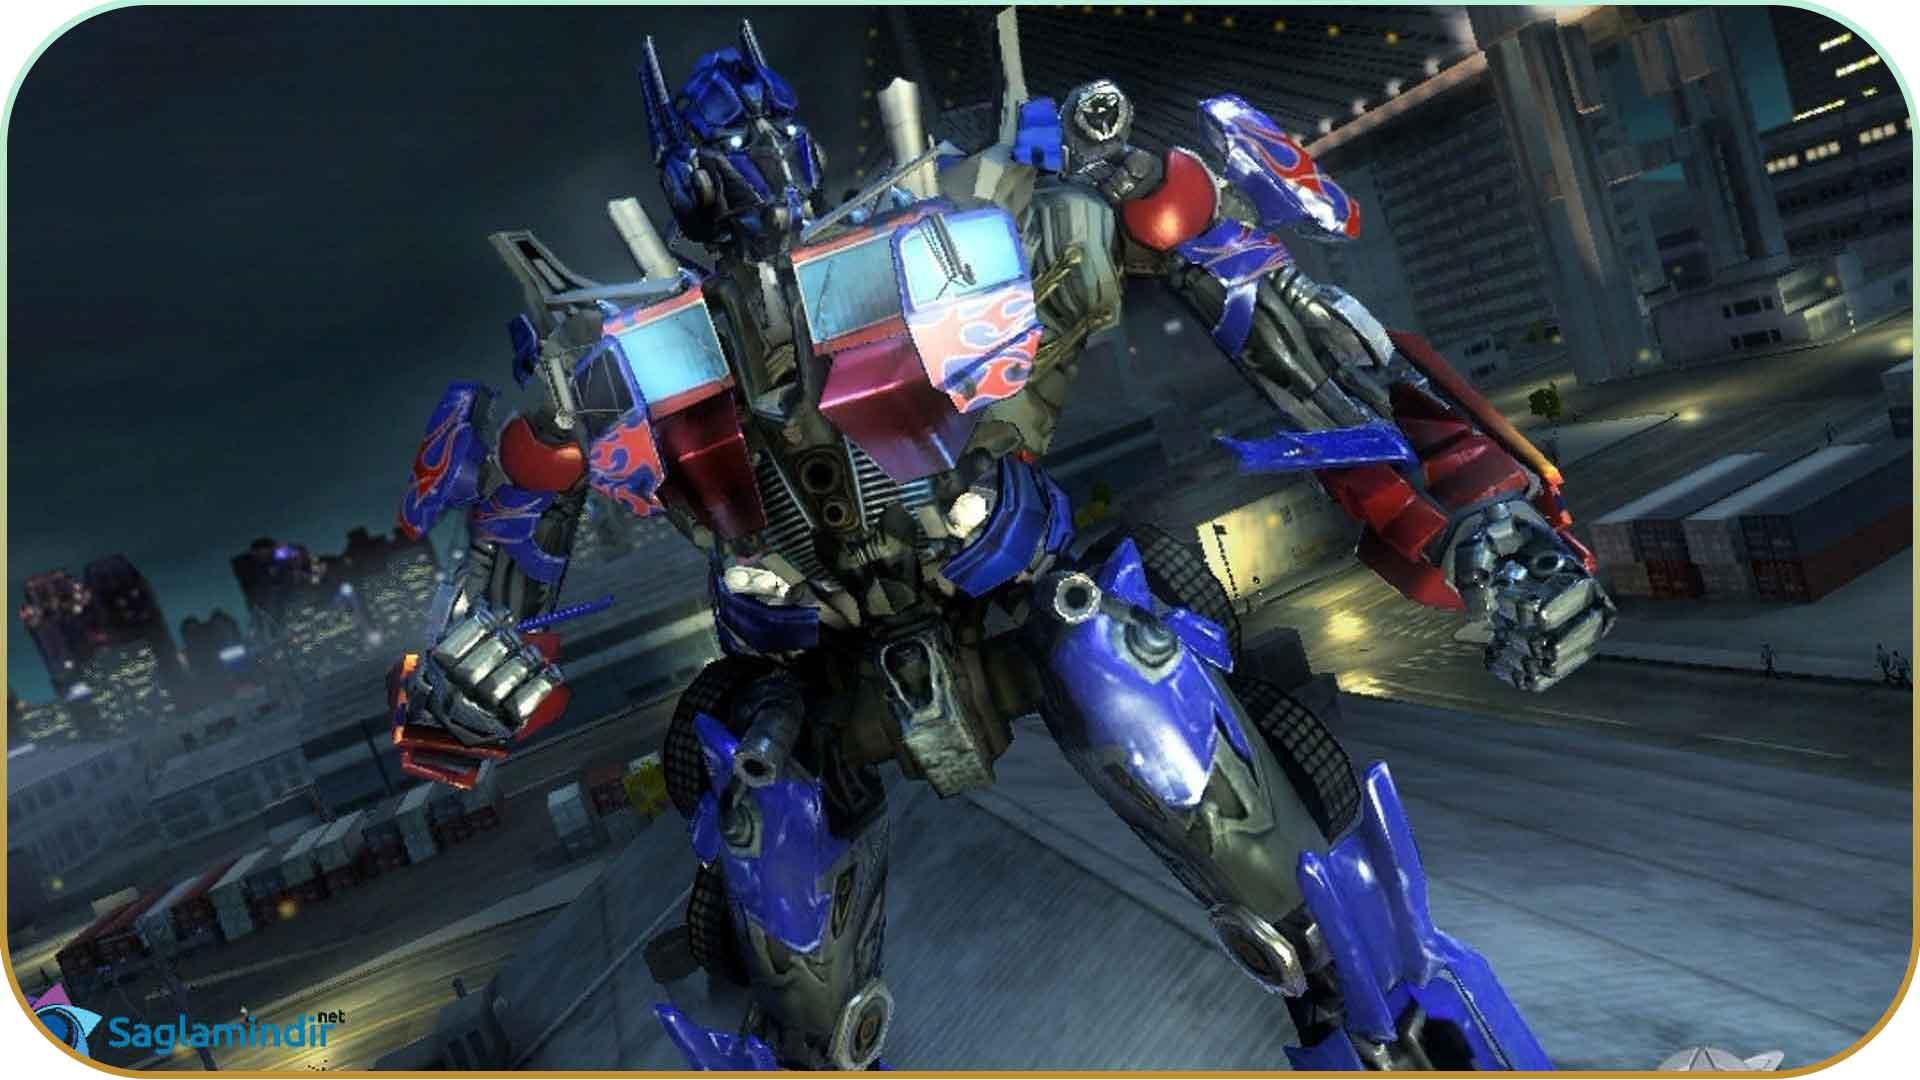 Transformers Revenge Of The Fallen saglamindir